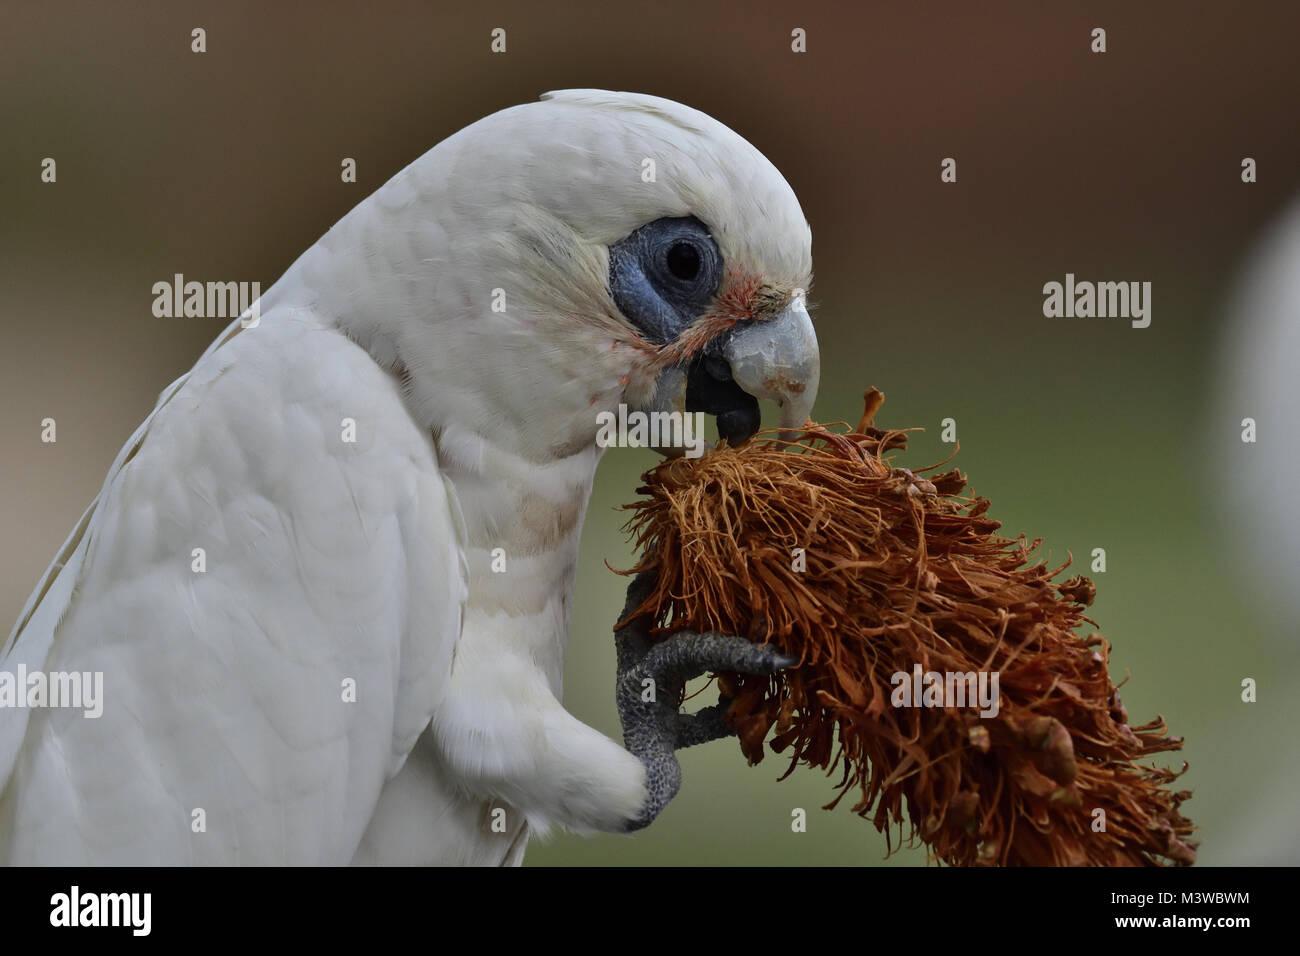 An Australian Little Corella eating a Pine Cone seed - Stock Image